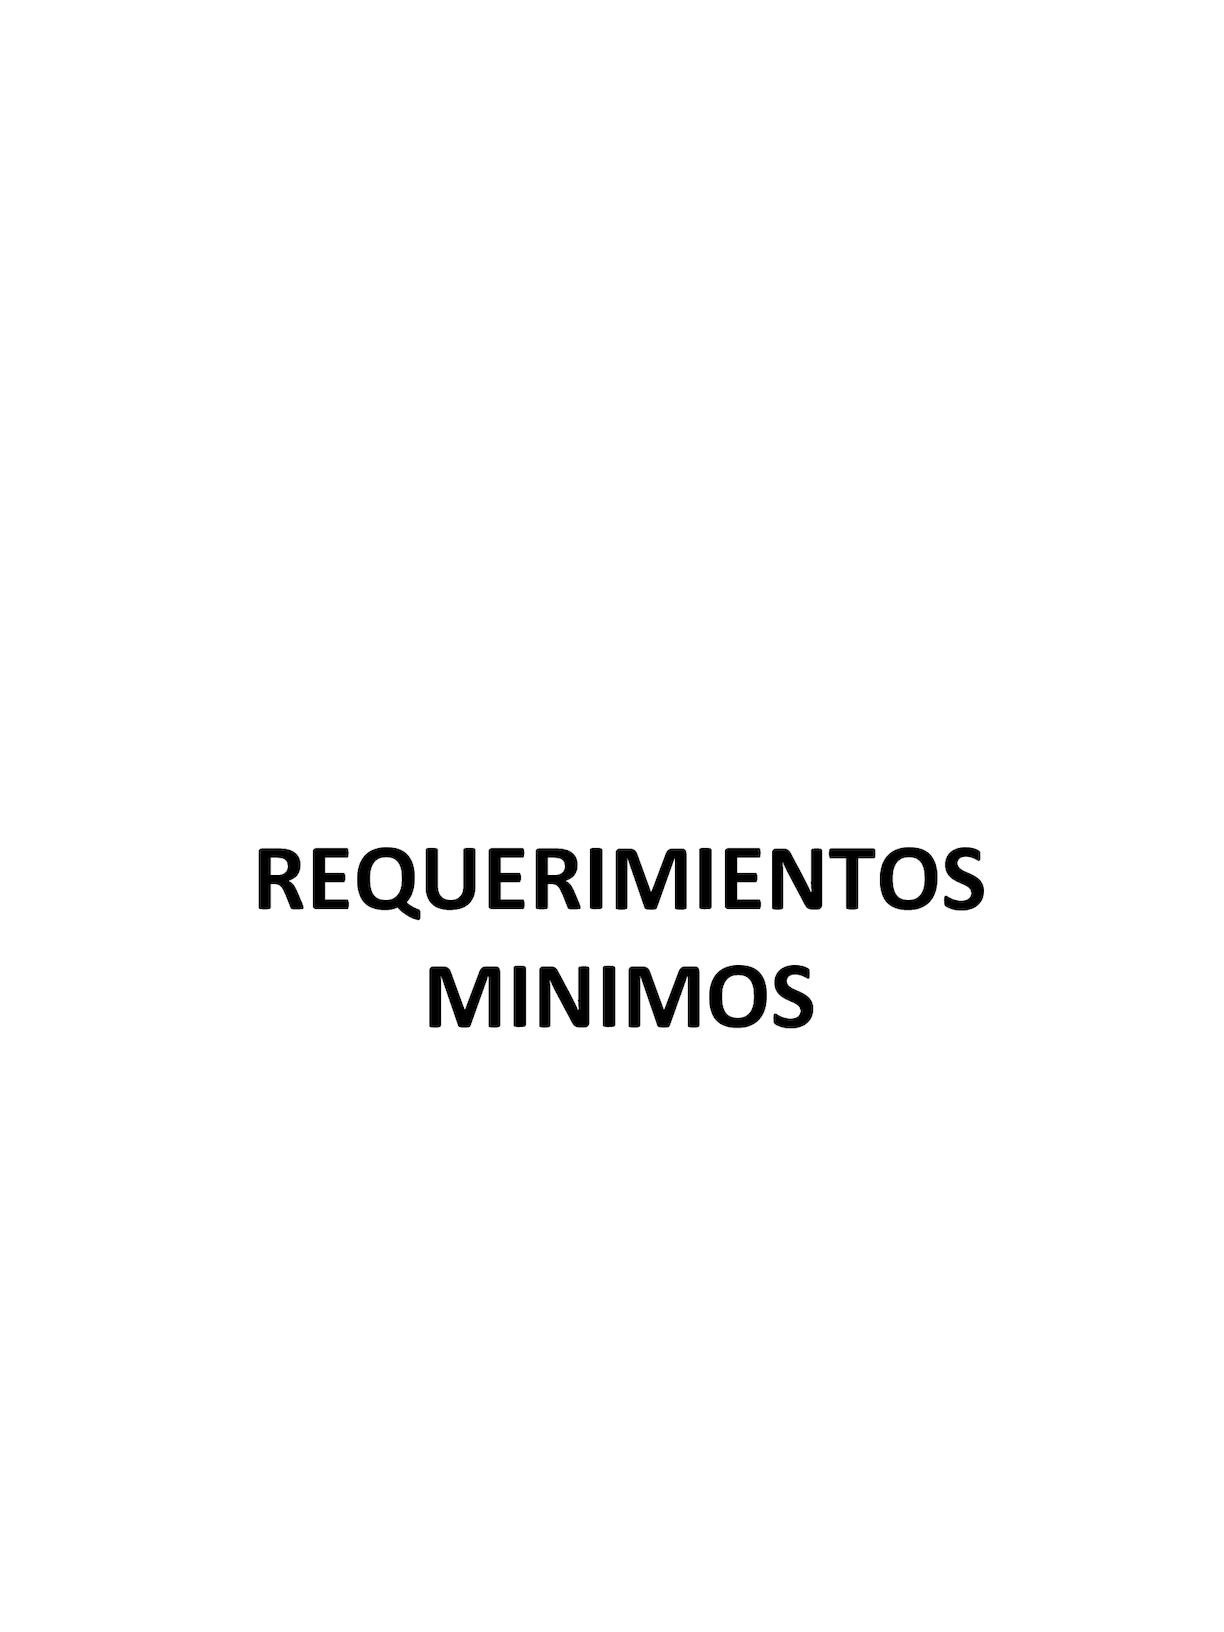 Dorable Curriculum Del Ministerio Inspiración - Ejemplo De Colección ...